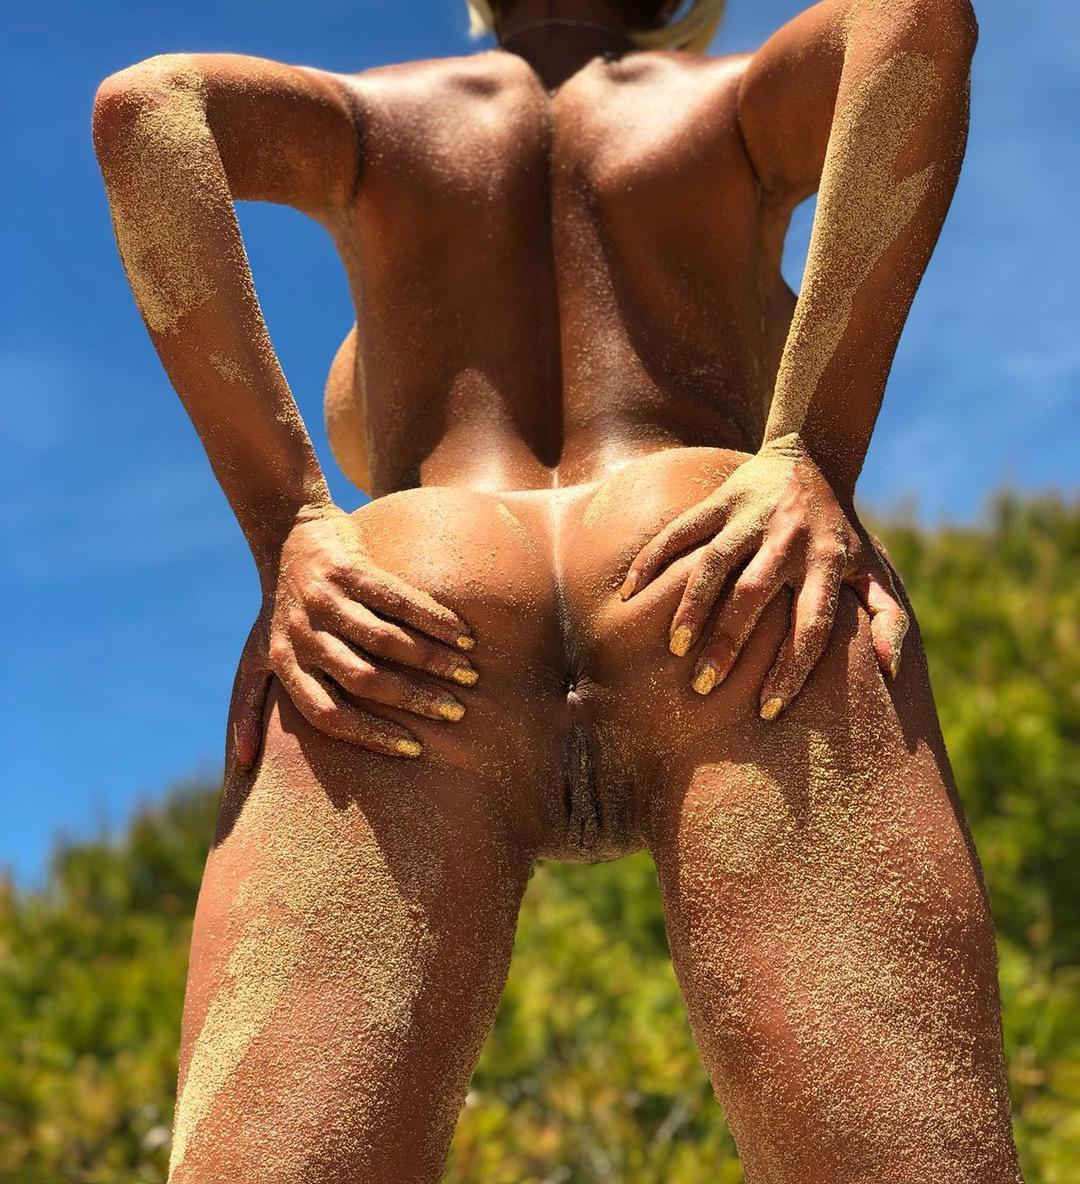 Ashton Avenue Ashtonavenue Onlyfans Nudes Leaks 0015